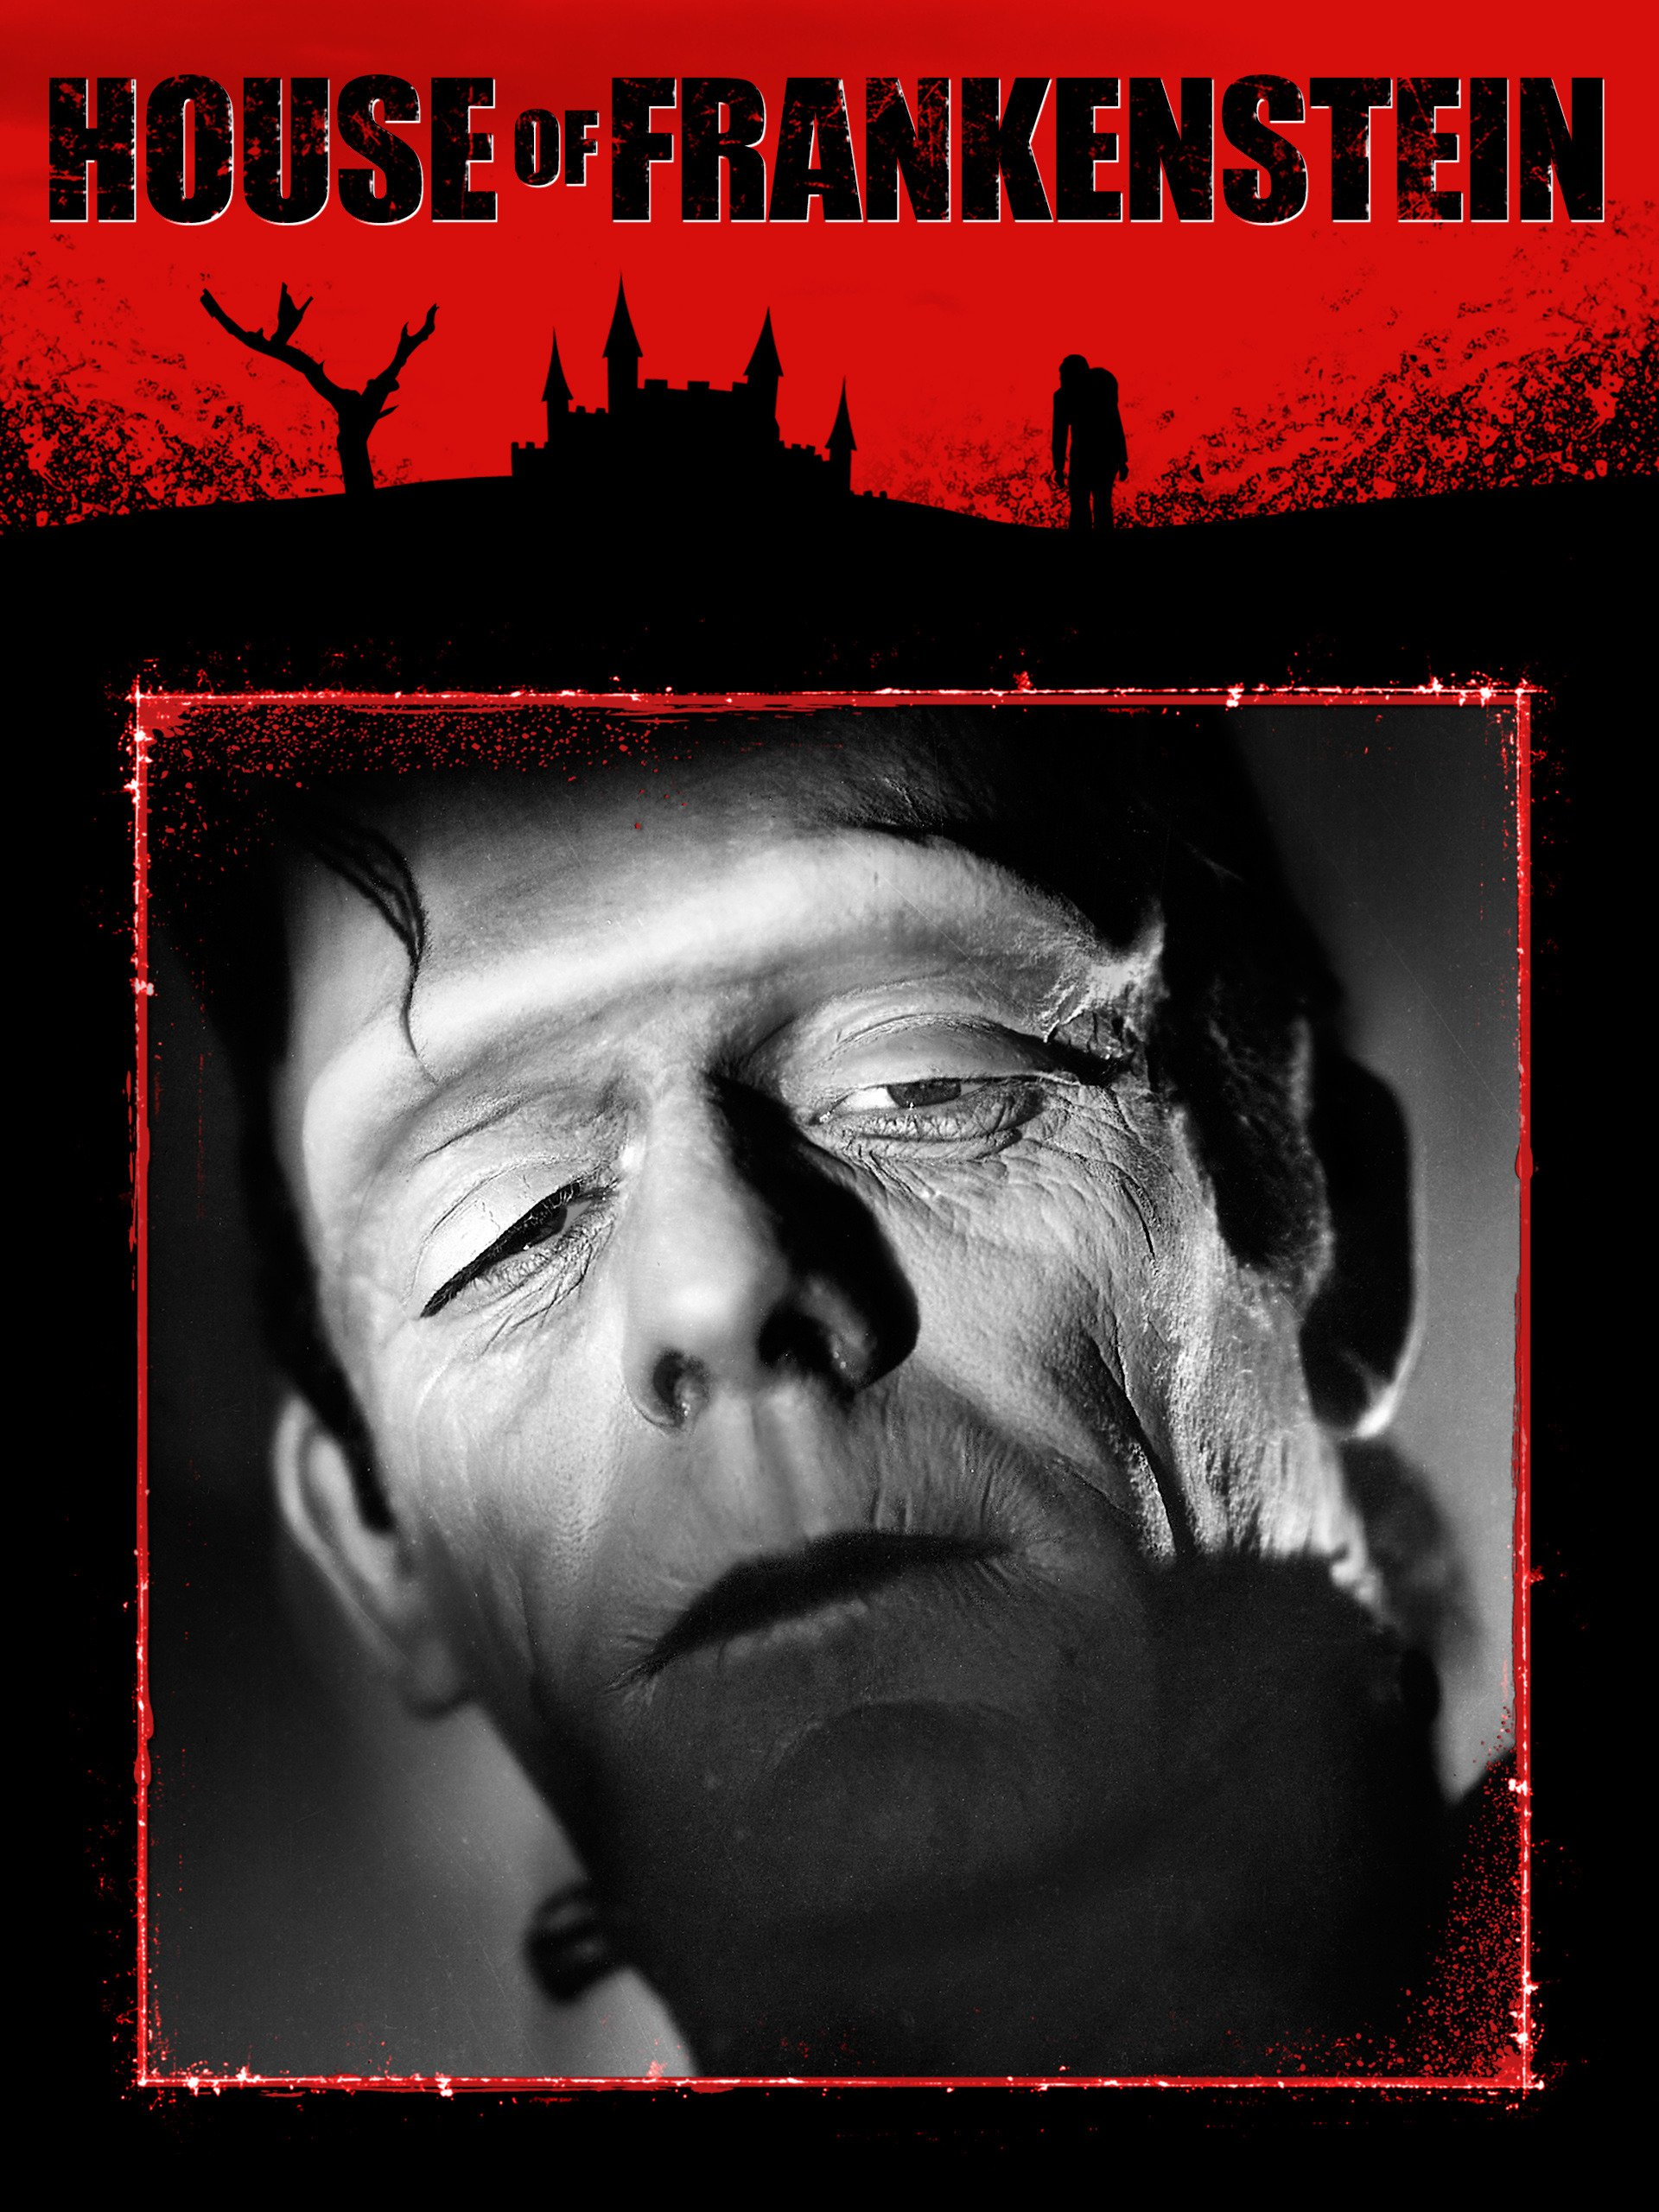 House of Frankenstein (1944), starring Boris Karloff, John Carradine, Lon Chaney Jr.,J. Carrol Naish, Glenn Strange, LionelAtwill, Anne Gwynne, Peter Coe